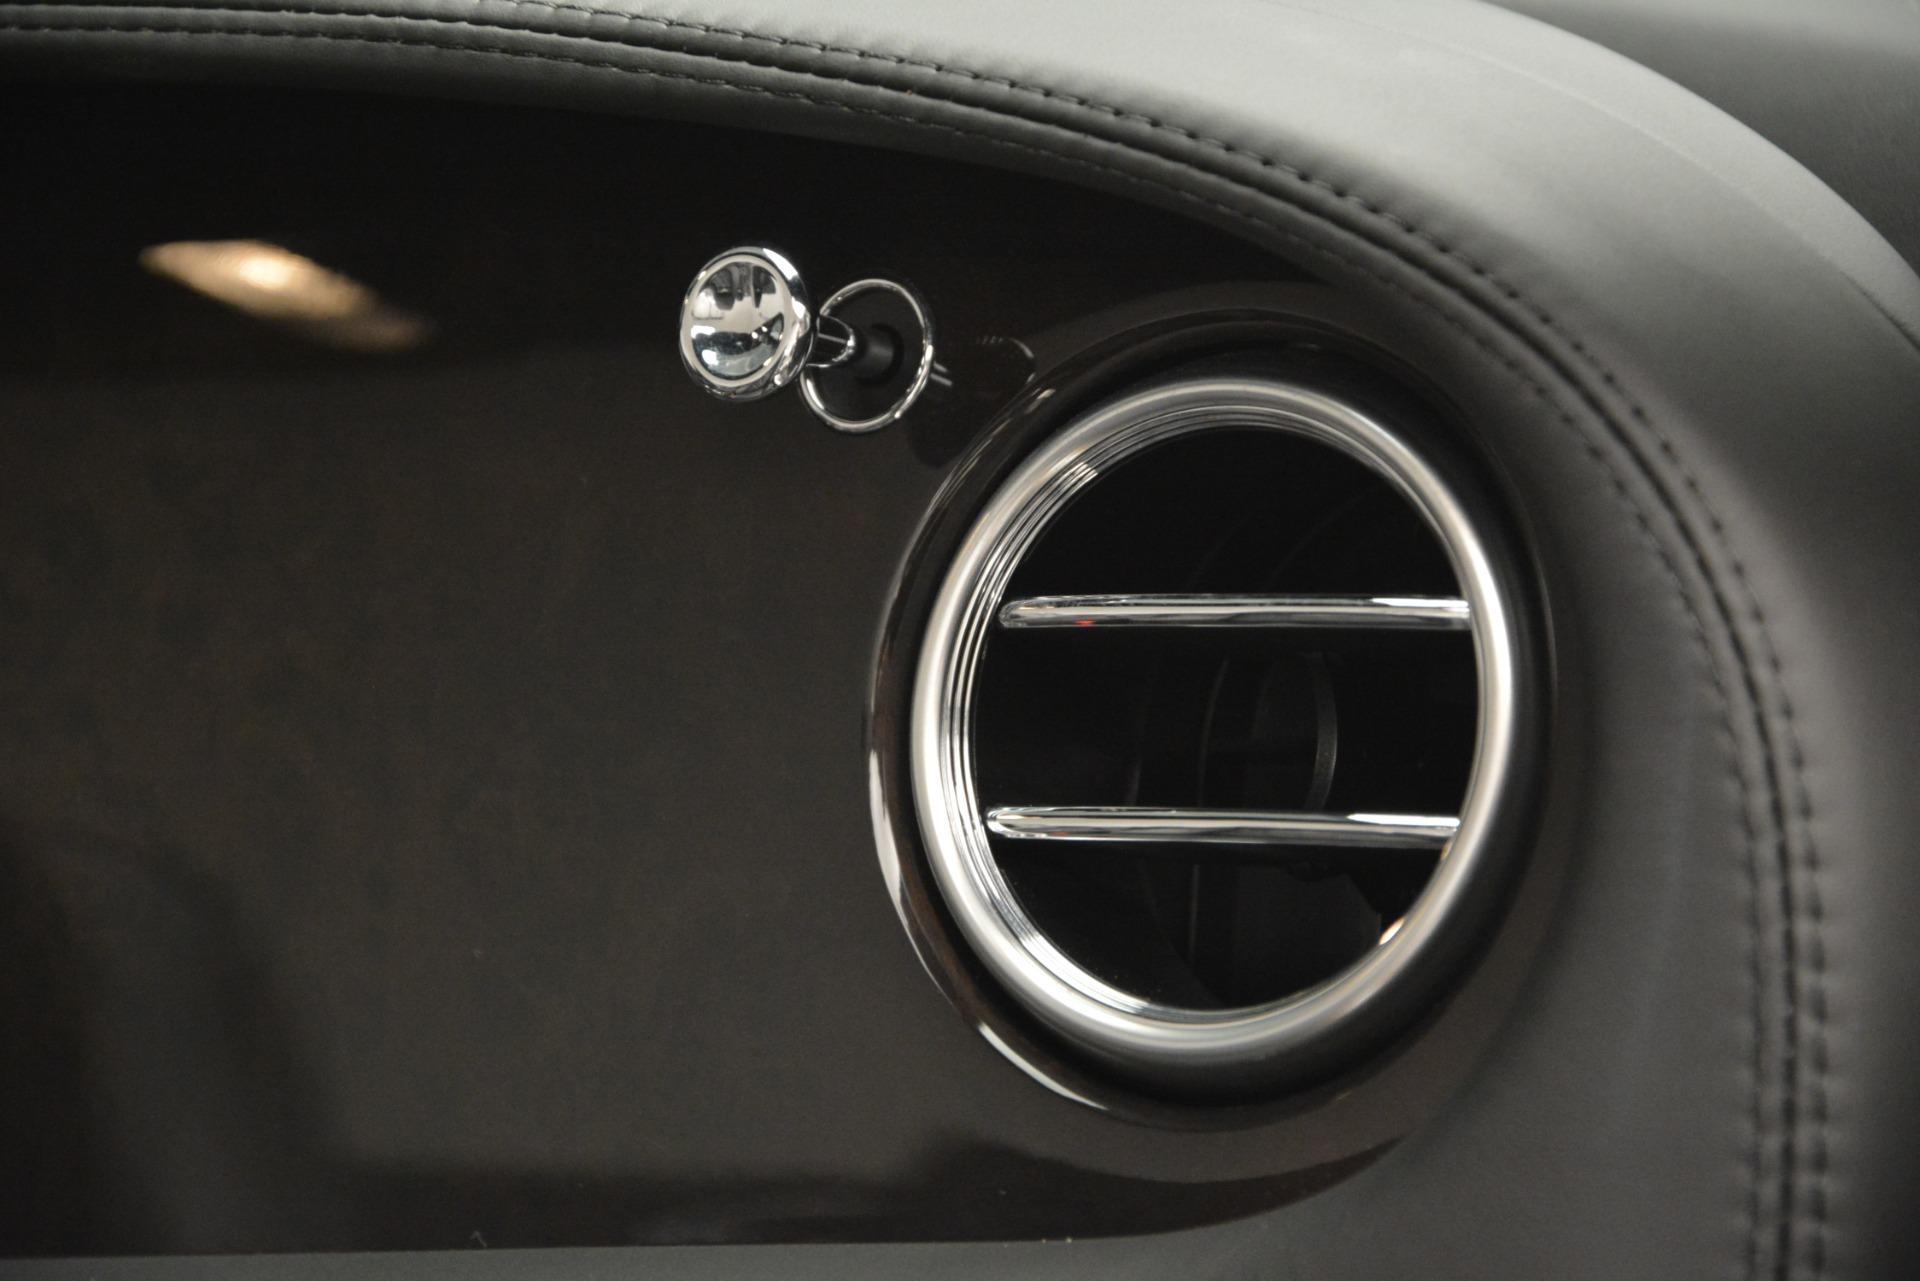 Used 2010 Bentley Continental GT Speed For Sale In Westport, CT 2677_p27